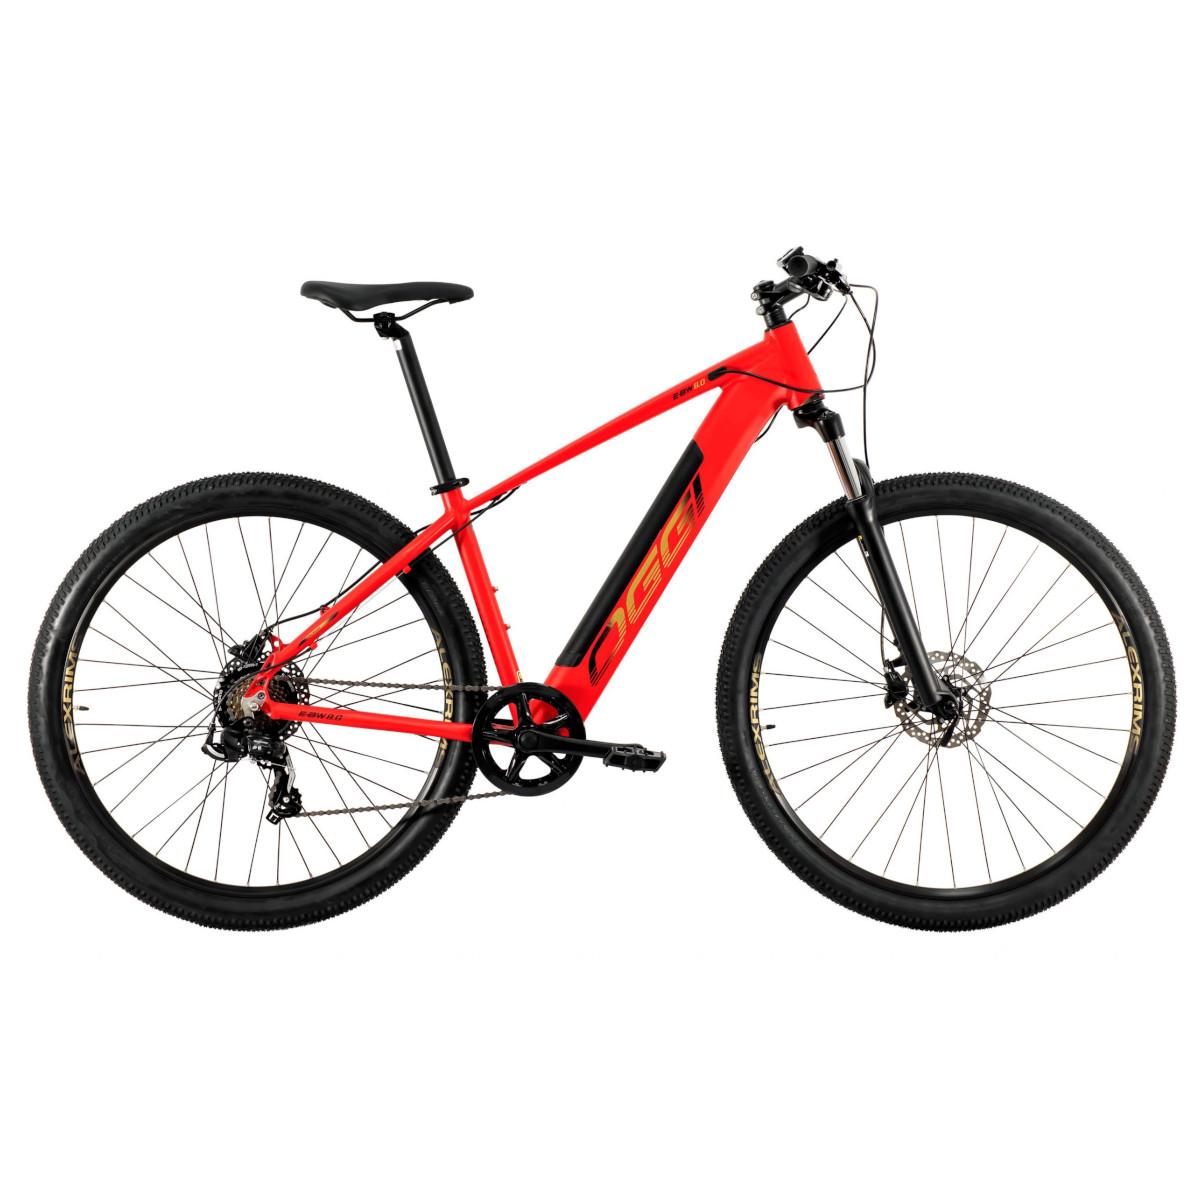 E-Bike Big Wheel 8.0 2021 Pedal Assistido